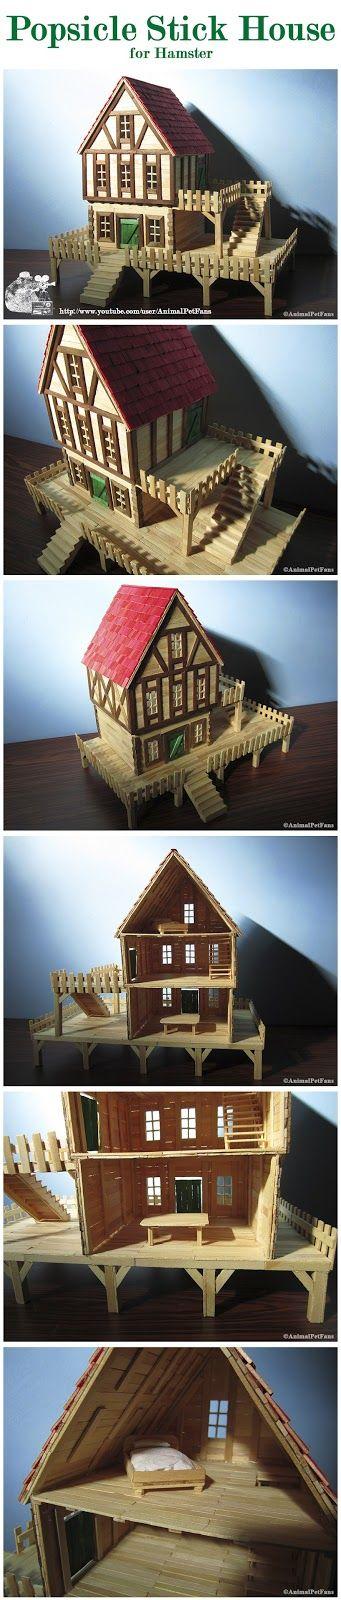 DIY Popsicle stick house for hamster - casinha de palitos para hamster by AnimalPetFans - Hamster DIY